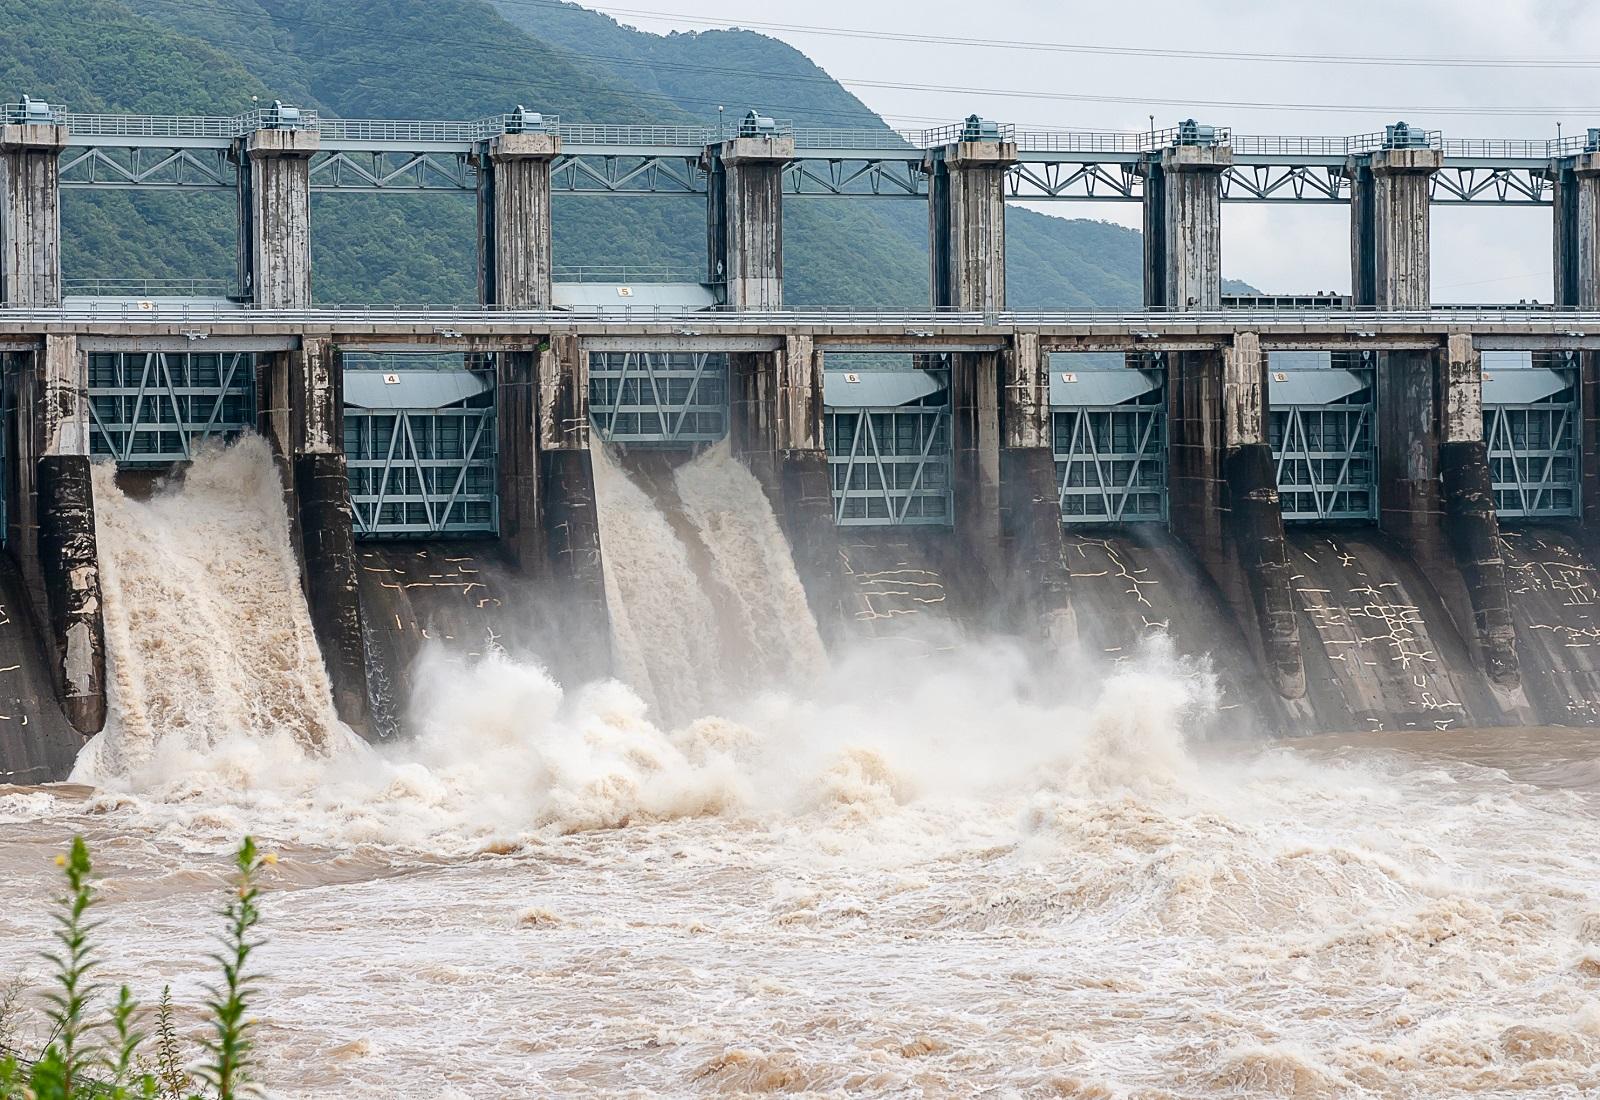 Upper Trishuli 1 Hydropower Project Multilateral